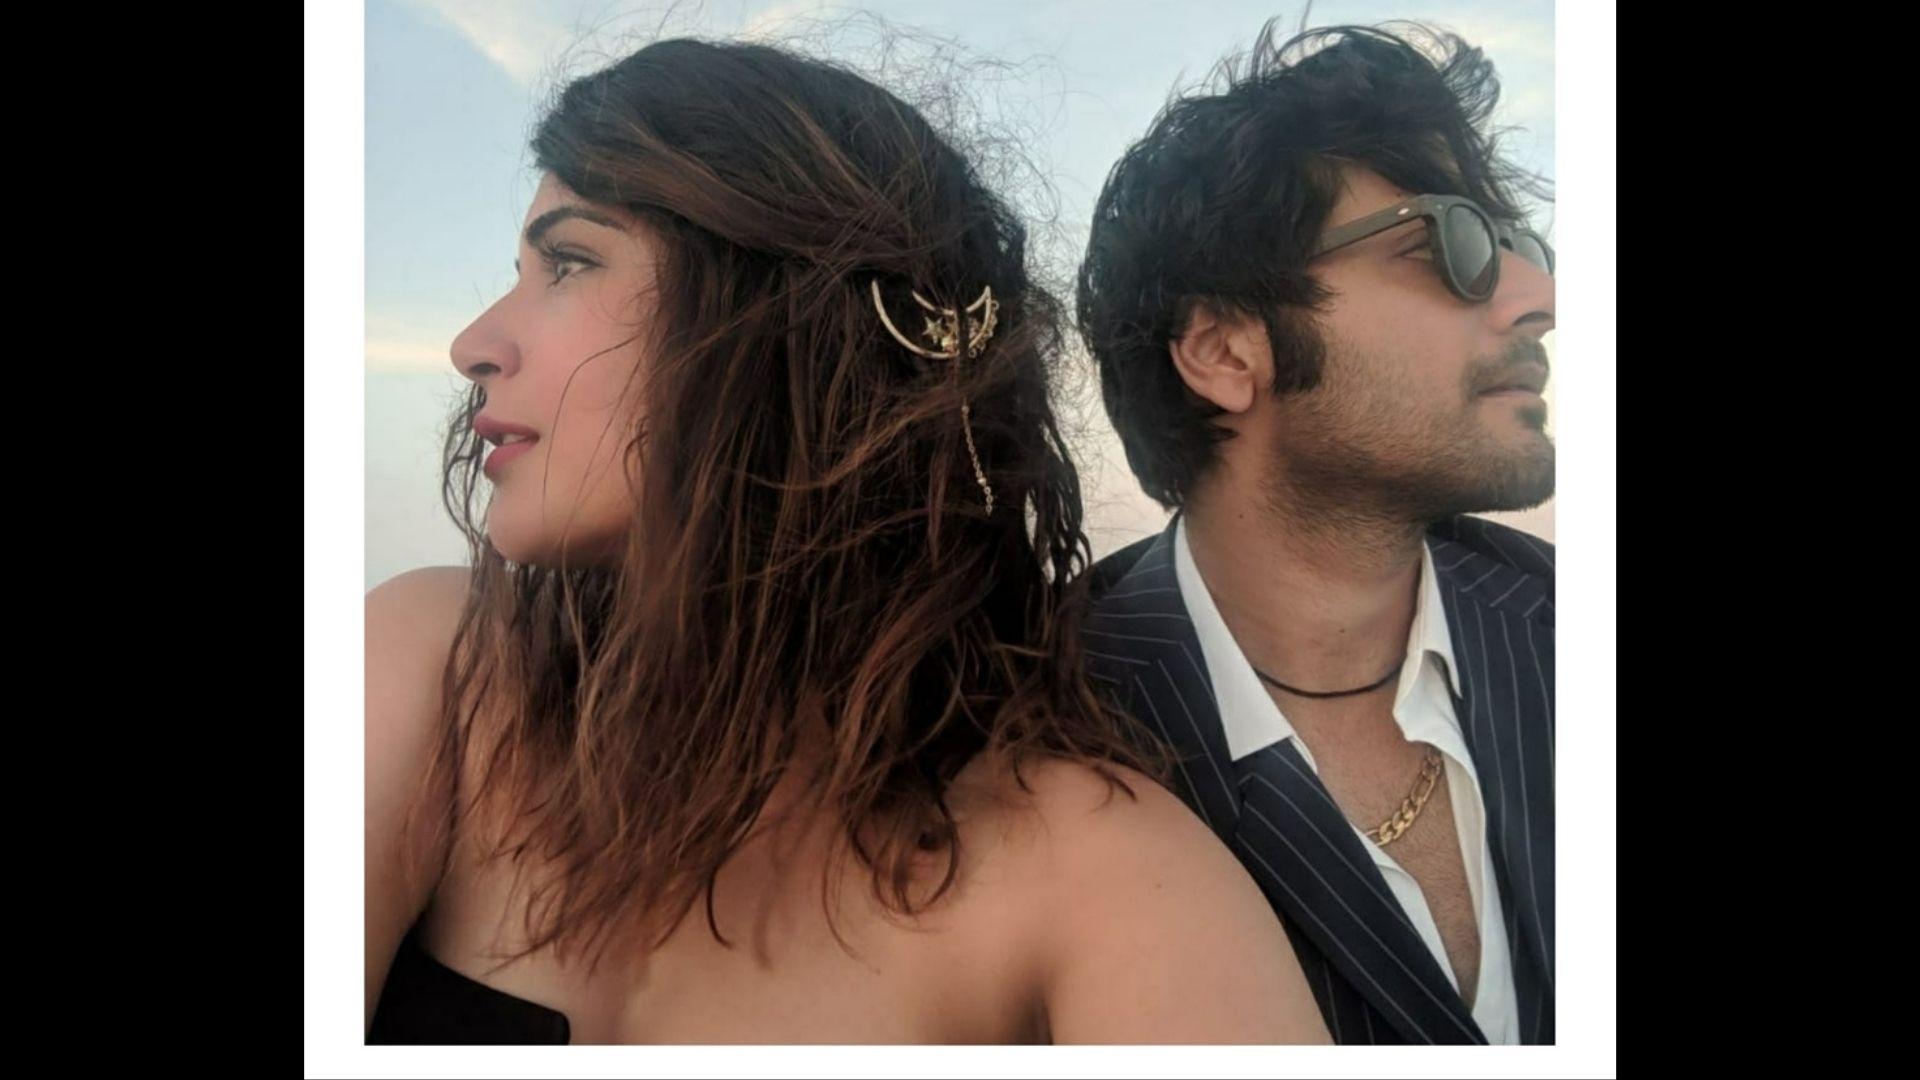 Kya Guddu Bhaiya Ghodi Chadenge? Ali Fazal Opens Up About His Impending Wedding Plans With Ladylove Richa Chadha